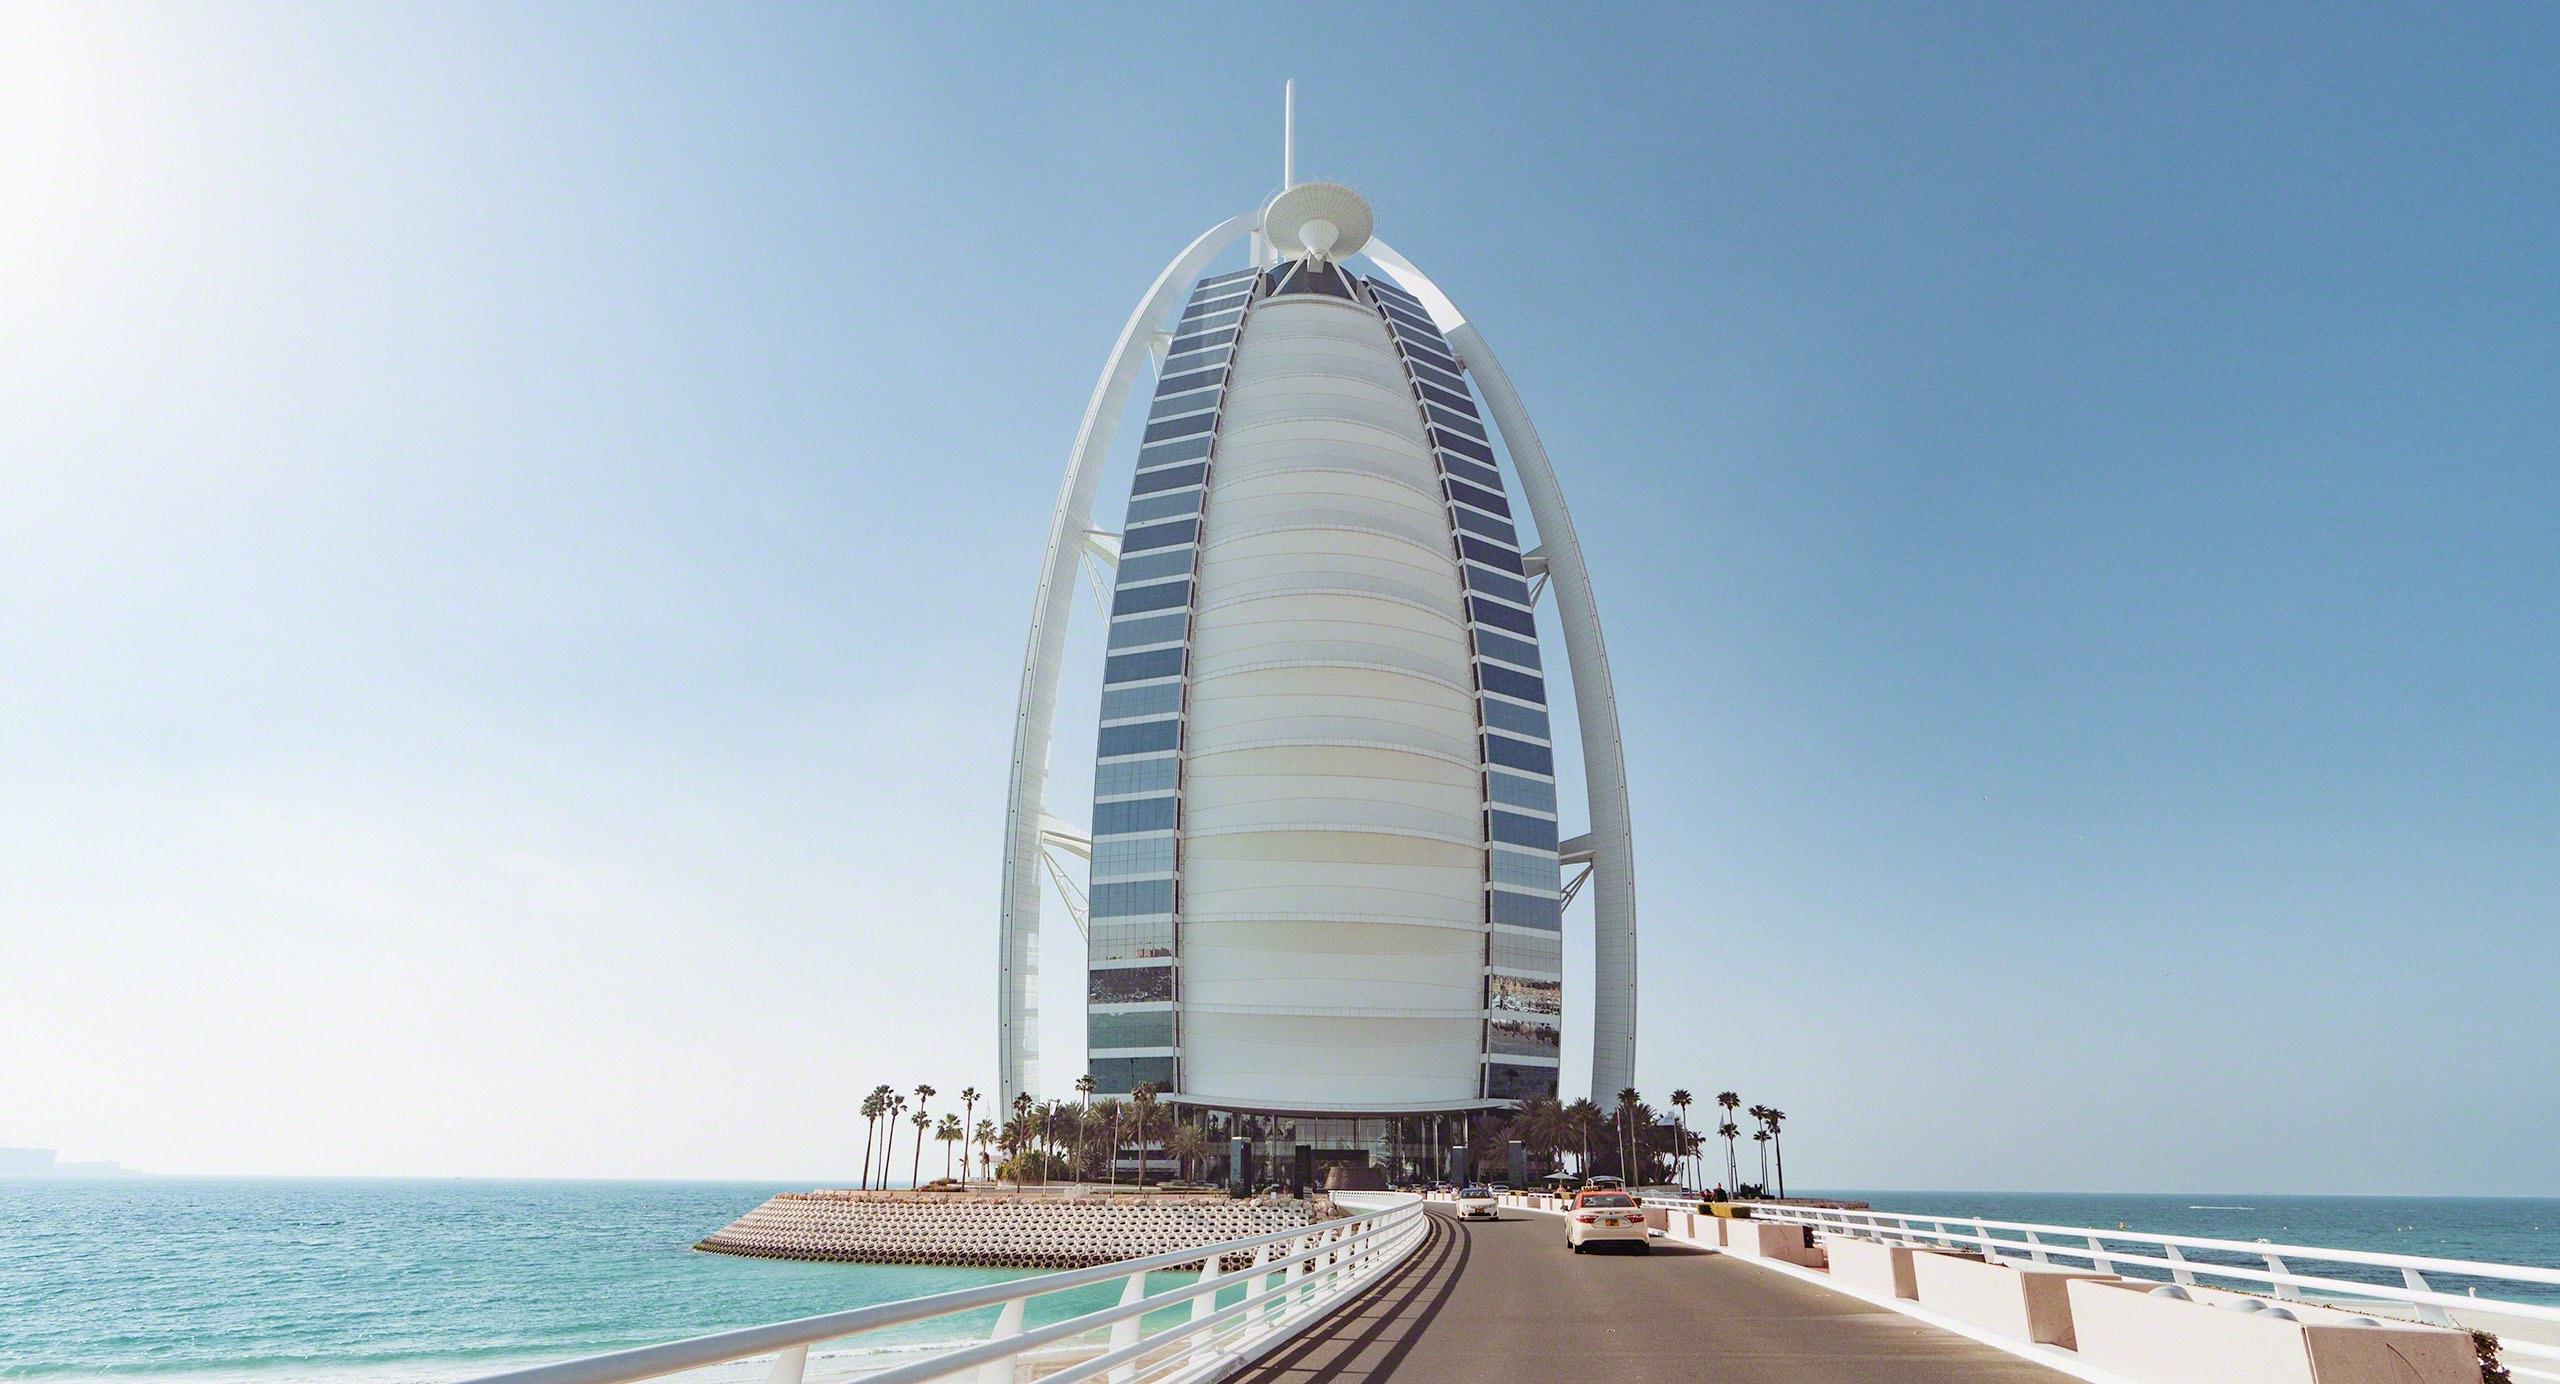 Eine Brücke samt Schranke hindert den freien Zutritt zum Luxushotel Burj Al Arab. Foto © Mirco Seyfert